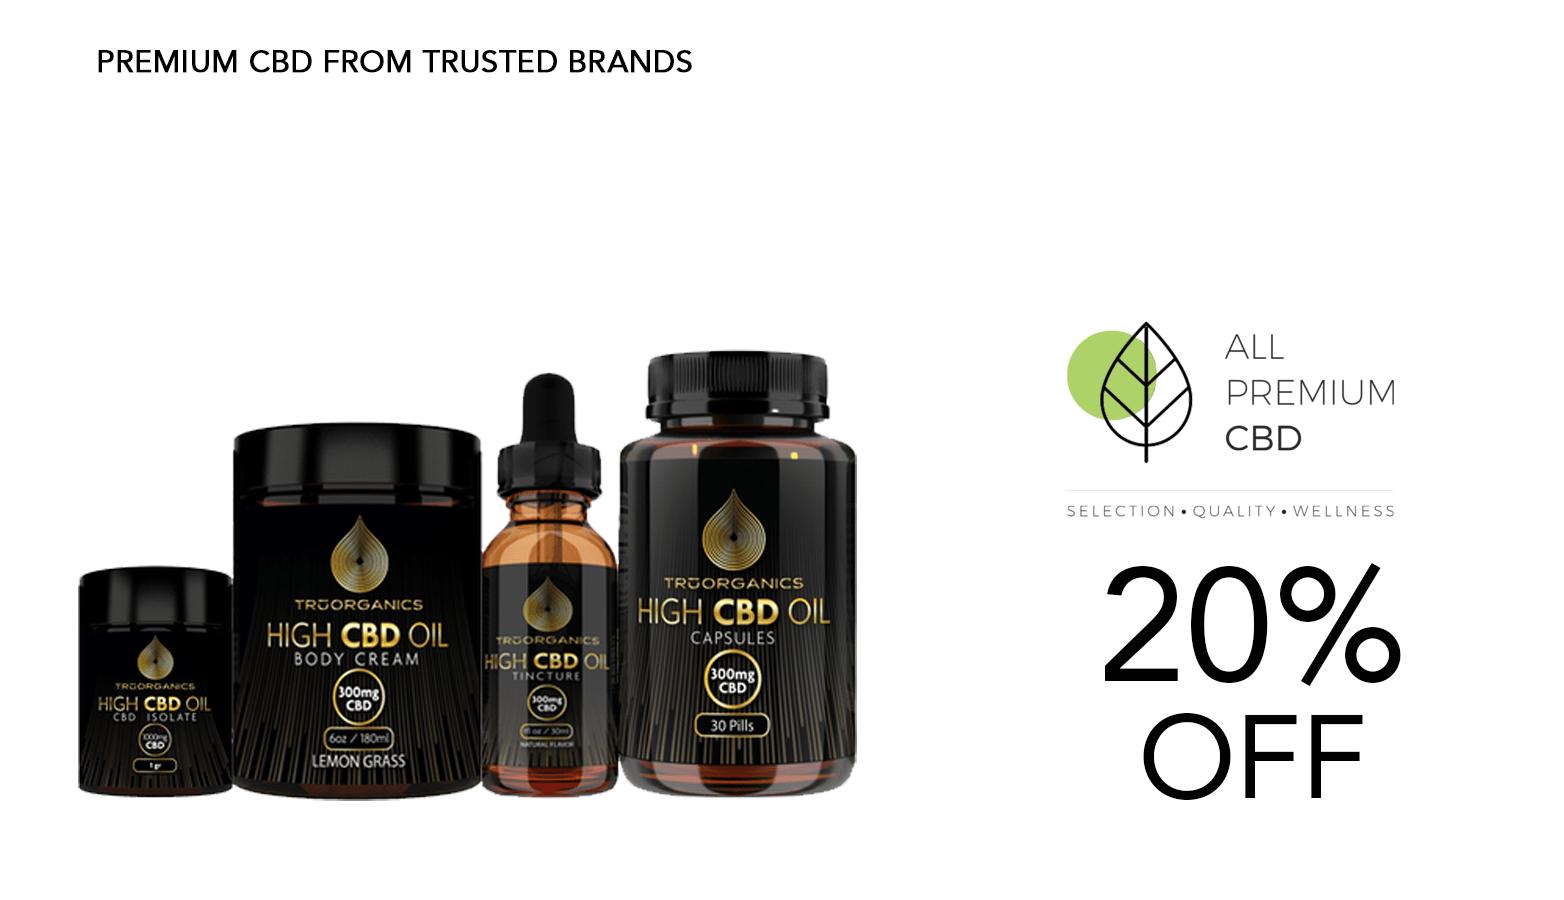 All Premium CBD Tru Organics Website